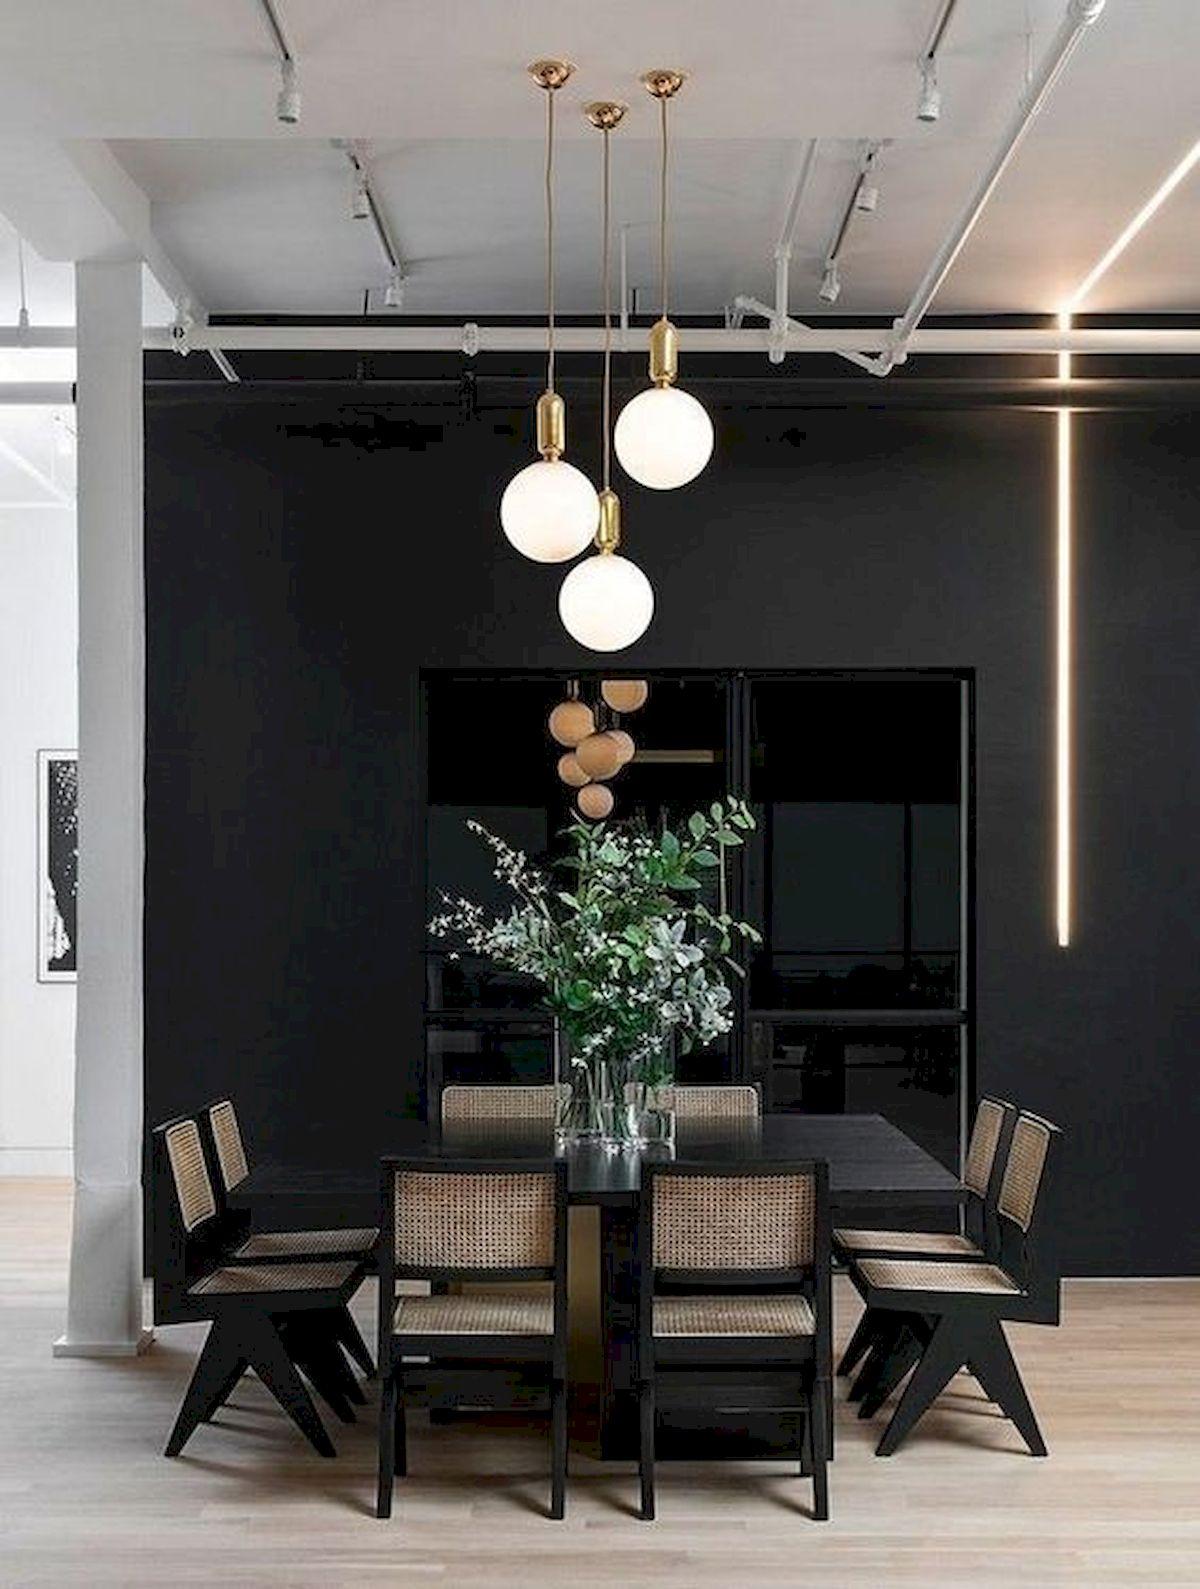 80 Elegant Modern Dining Room Design and Decor Ideas (55)